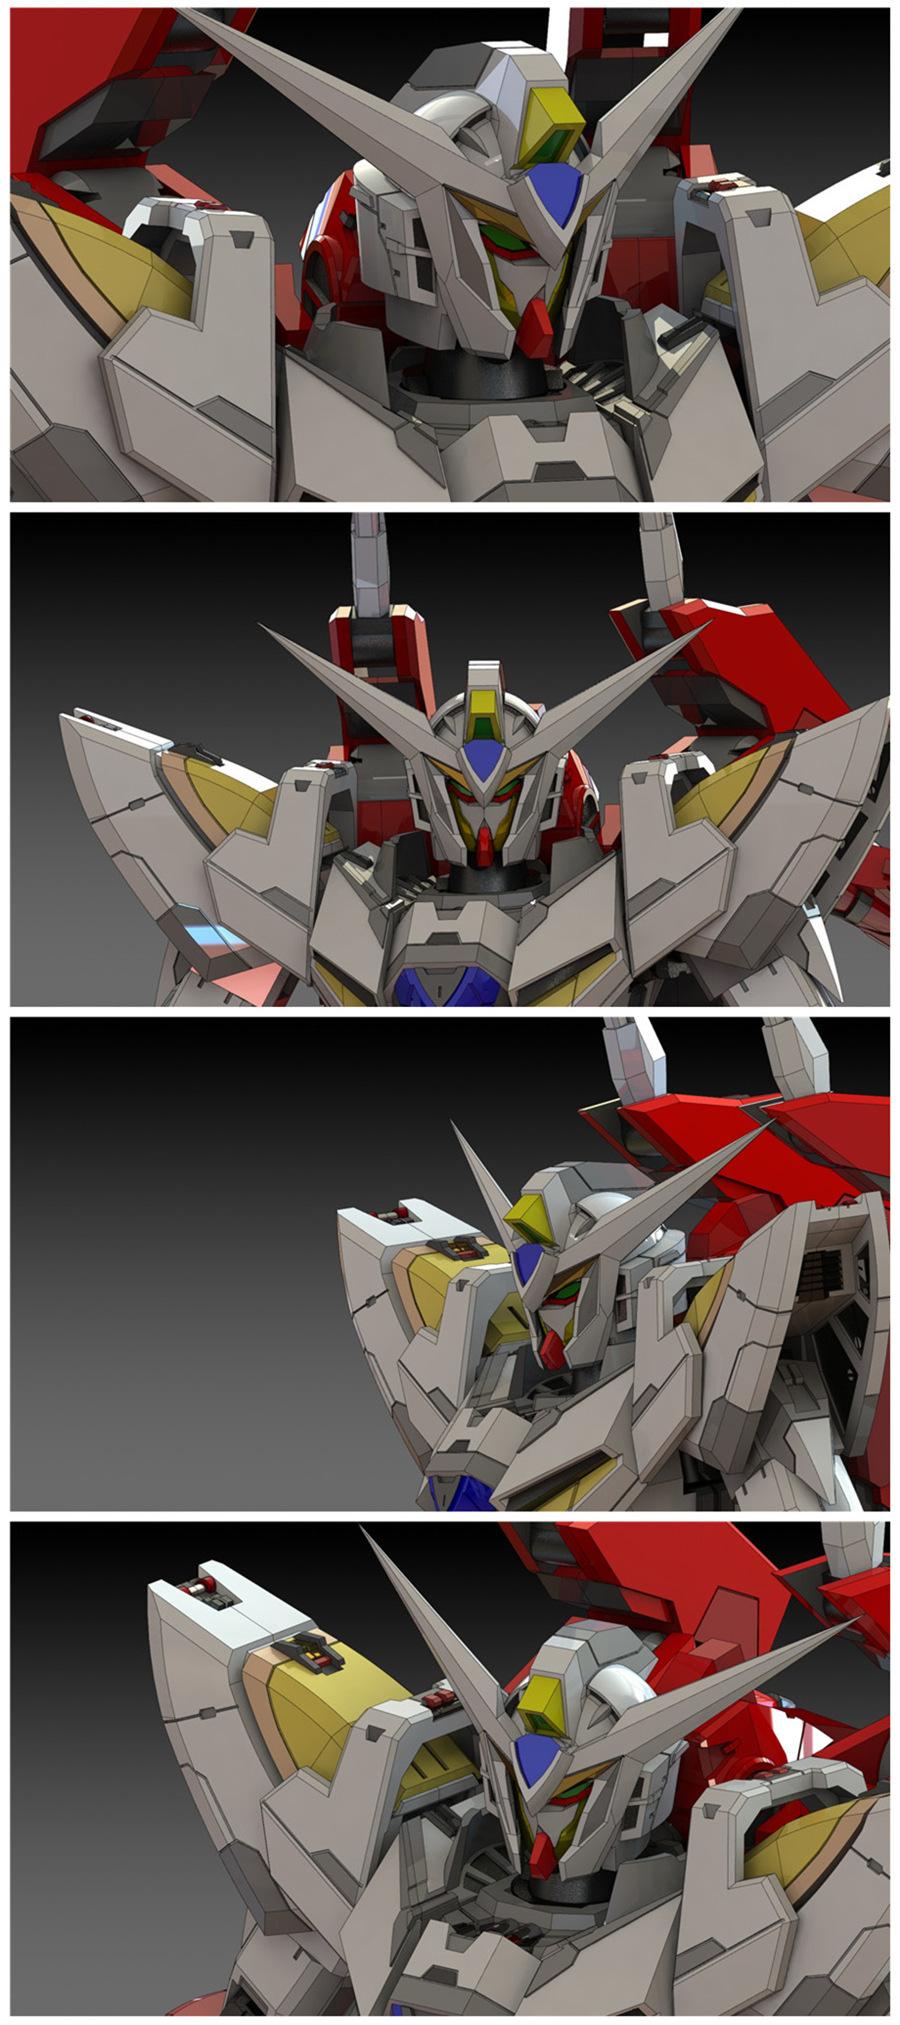 G152_Ribonzu_mg_info_inask_050.jpg